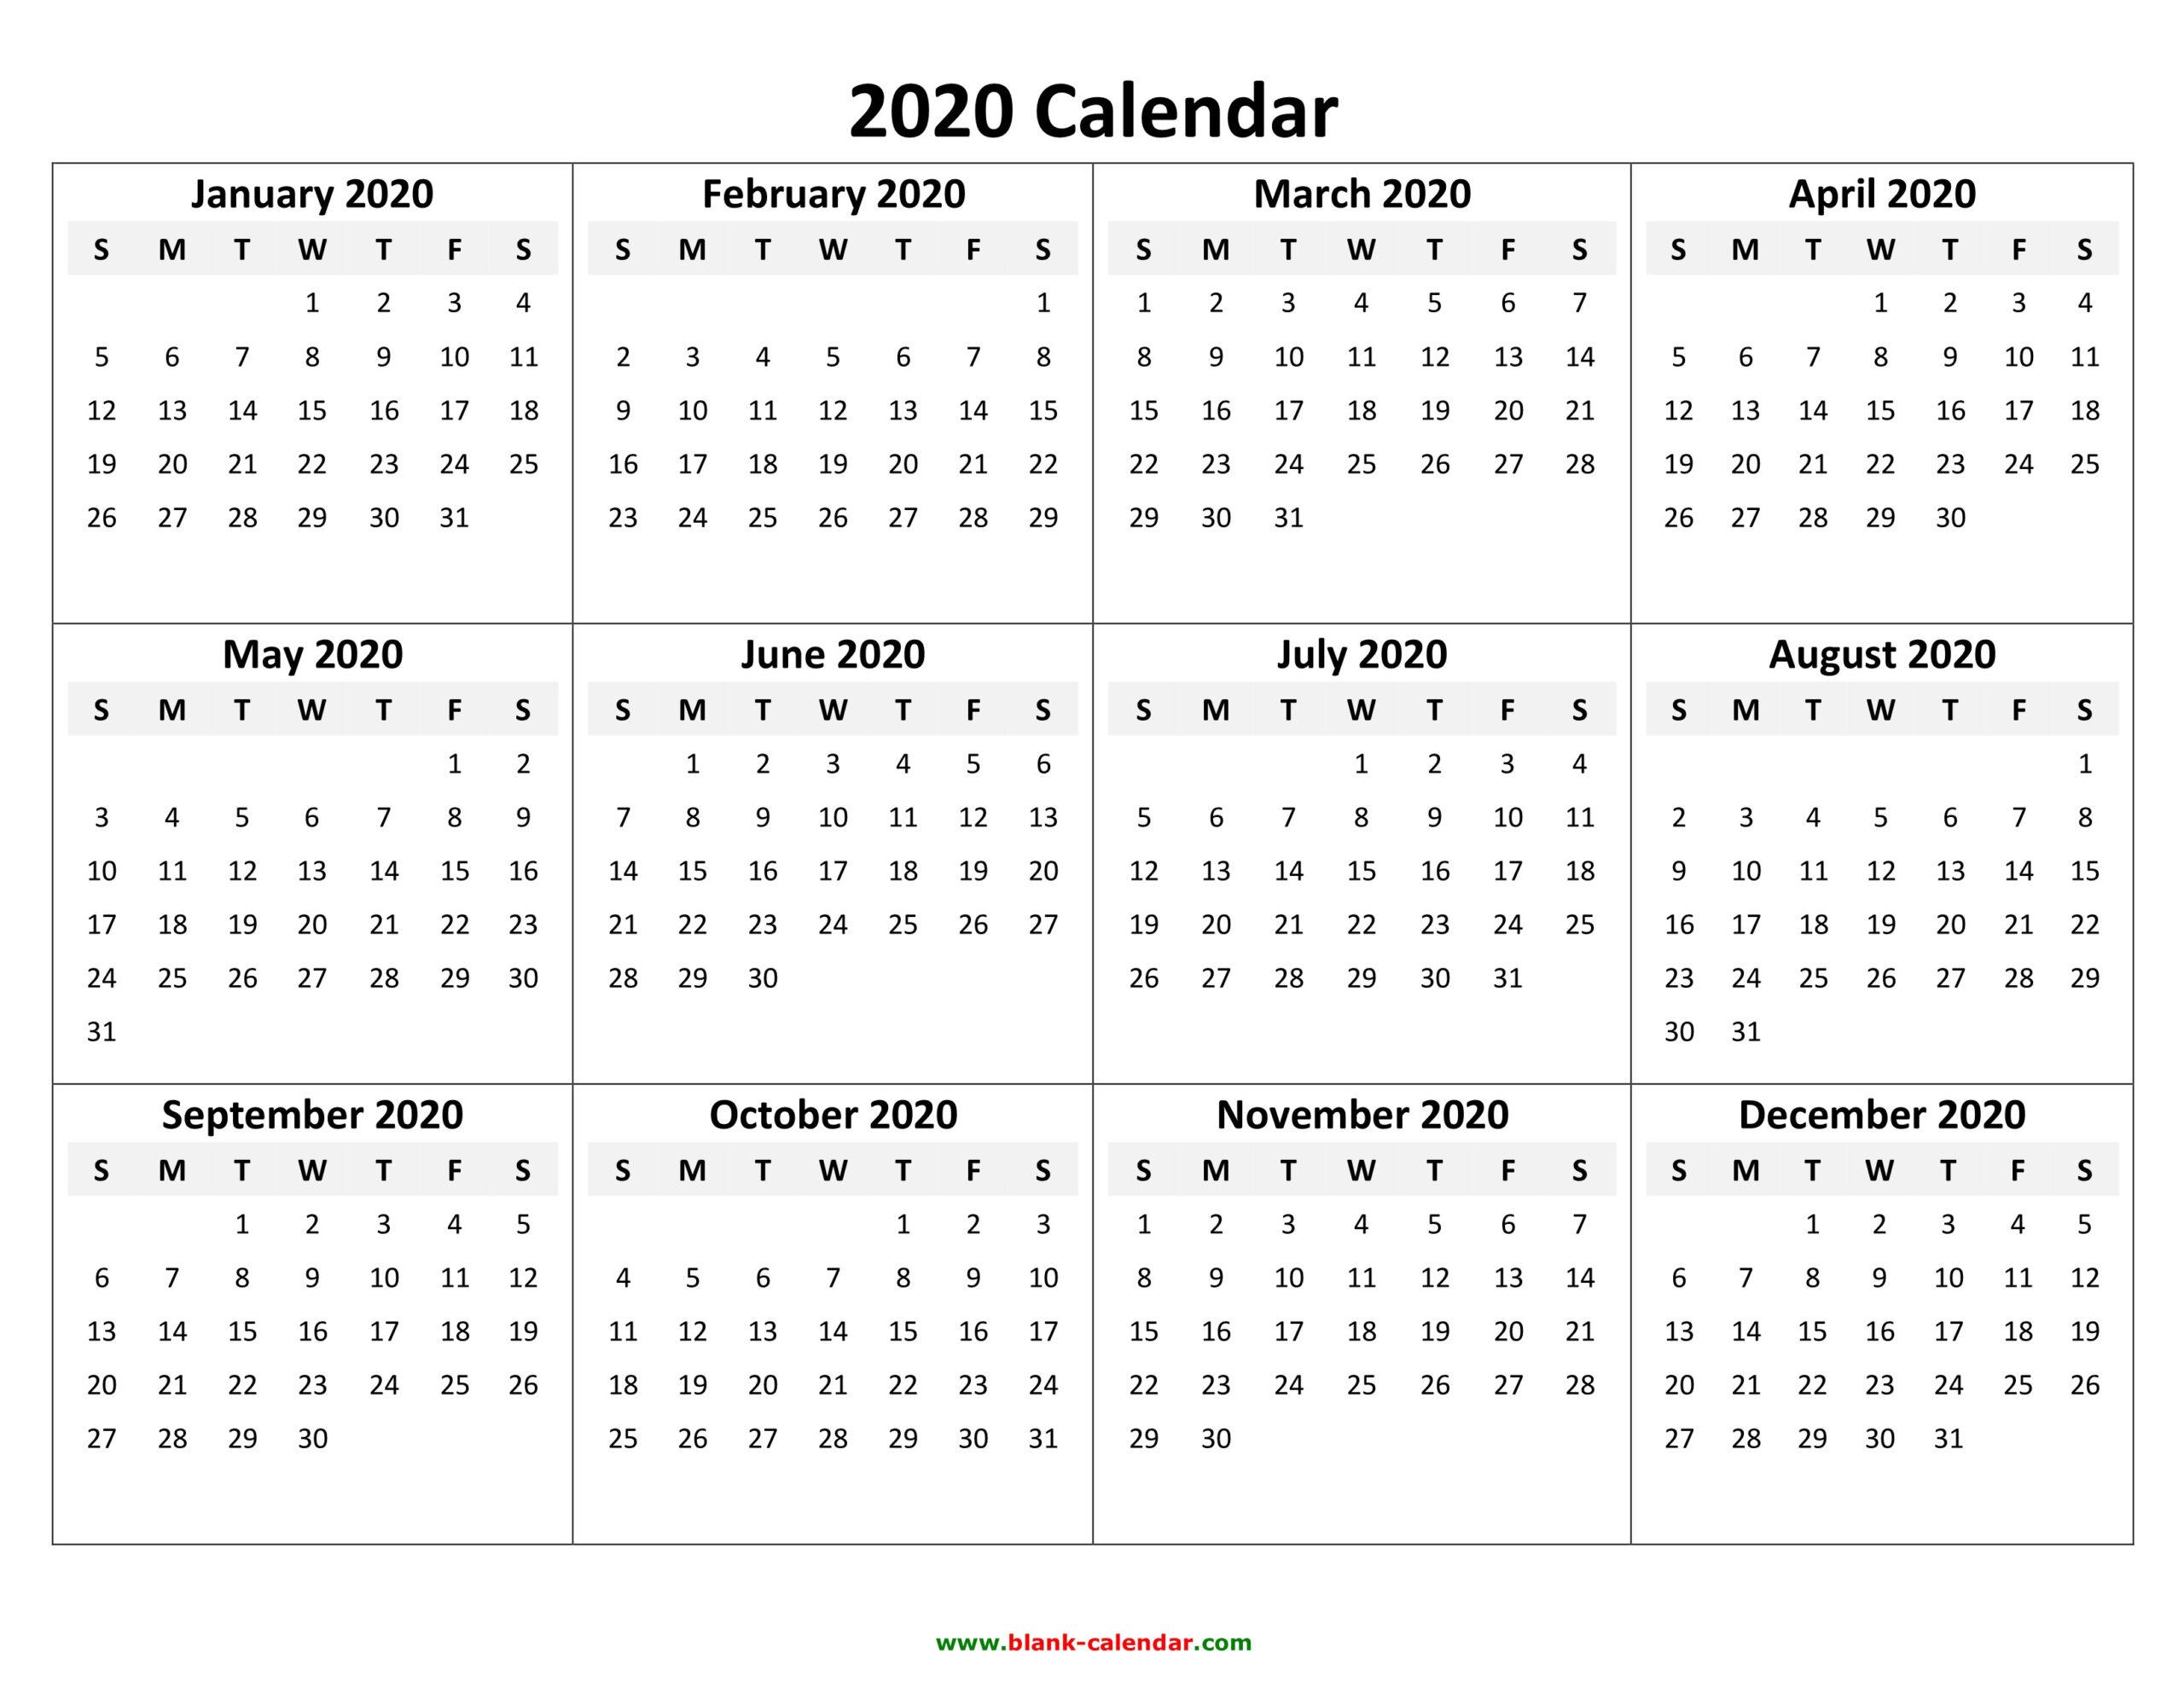 Free 2020 Printable Calendar Templates - Create Your Own  Free Editable Calendar Templates Printable